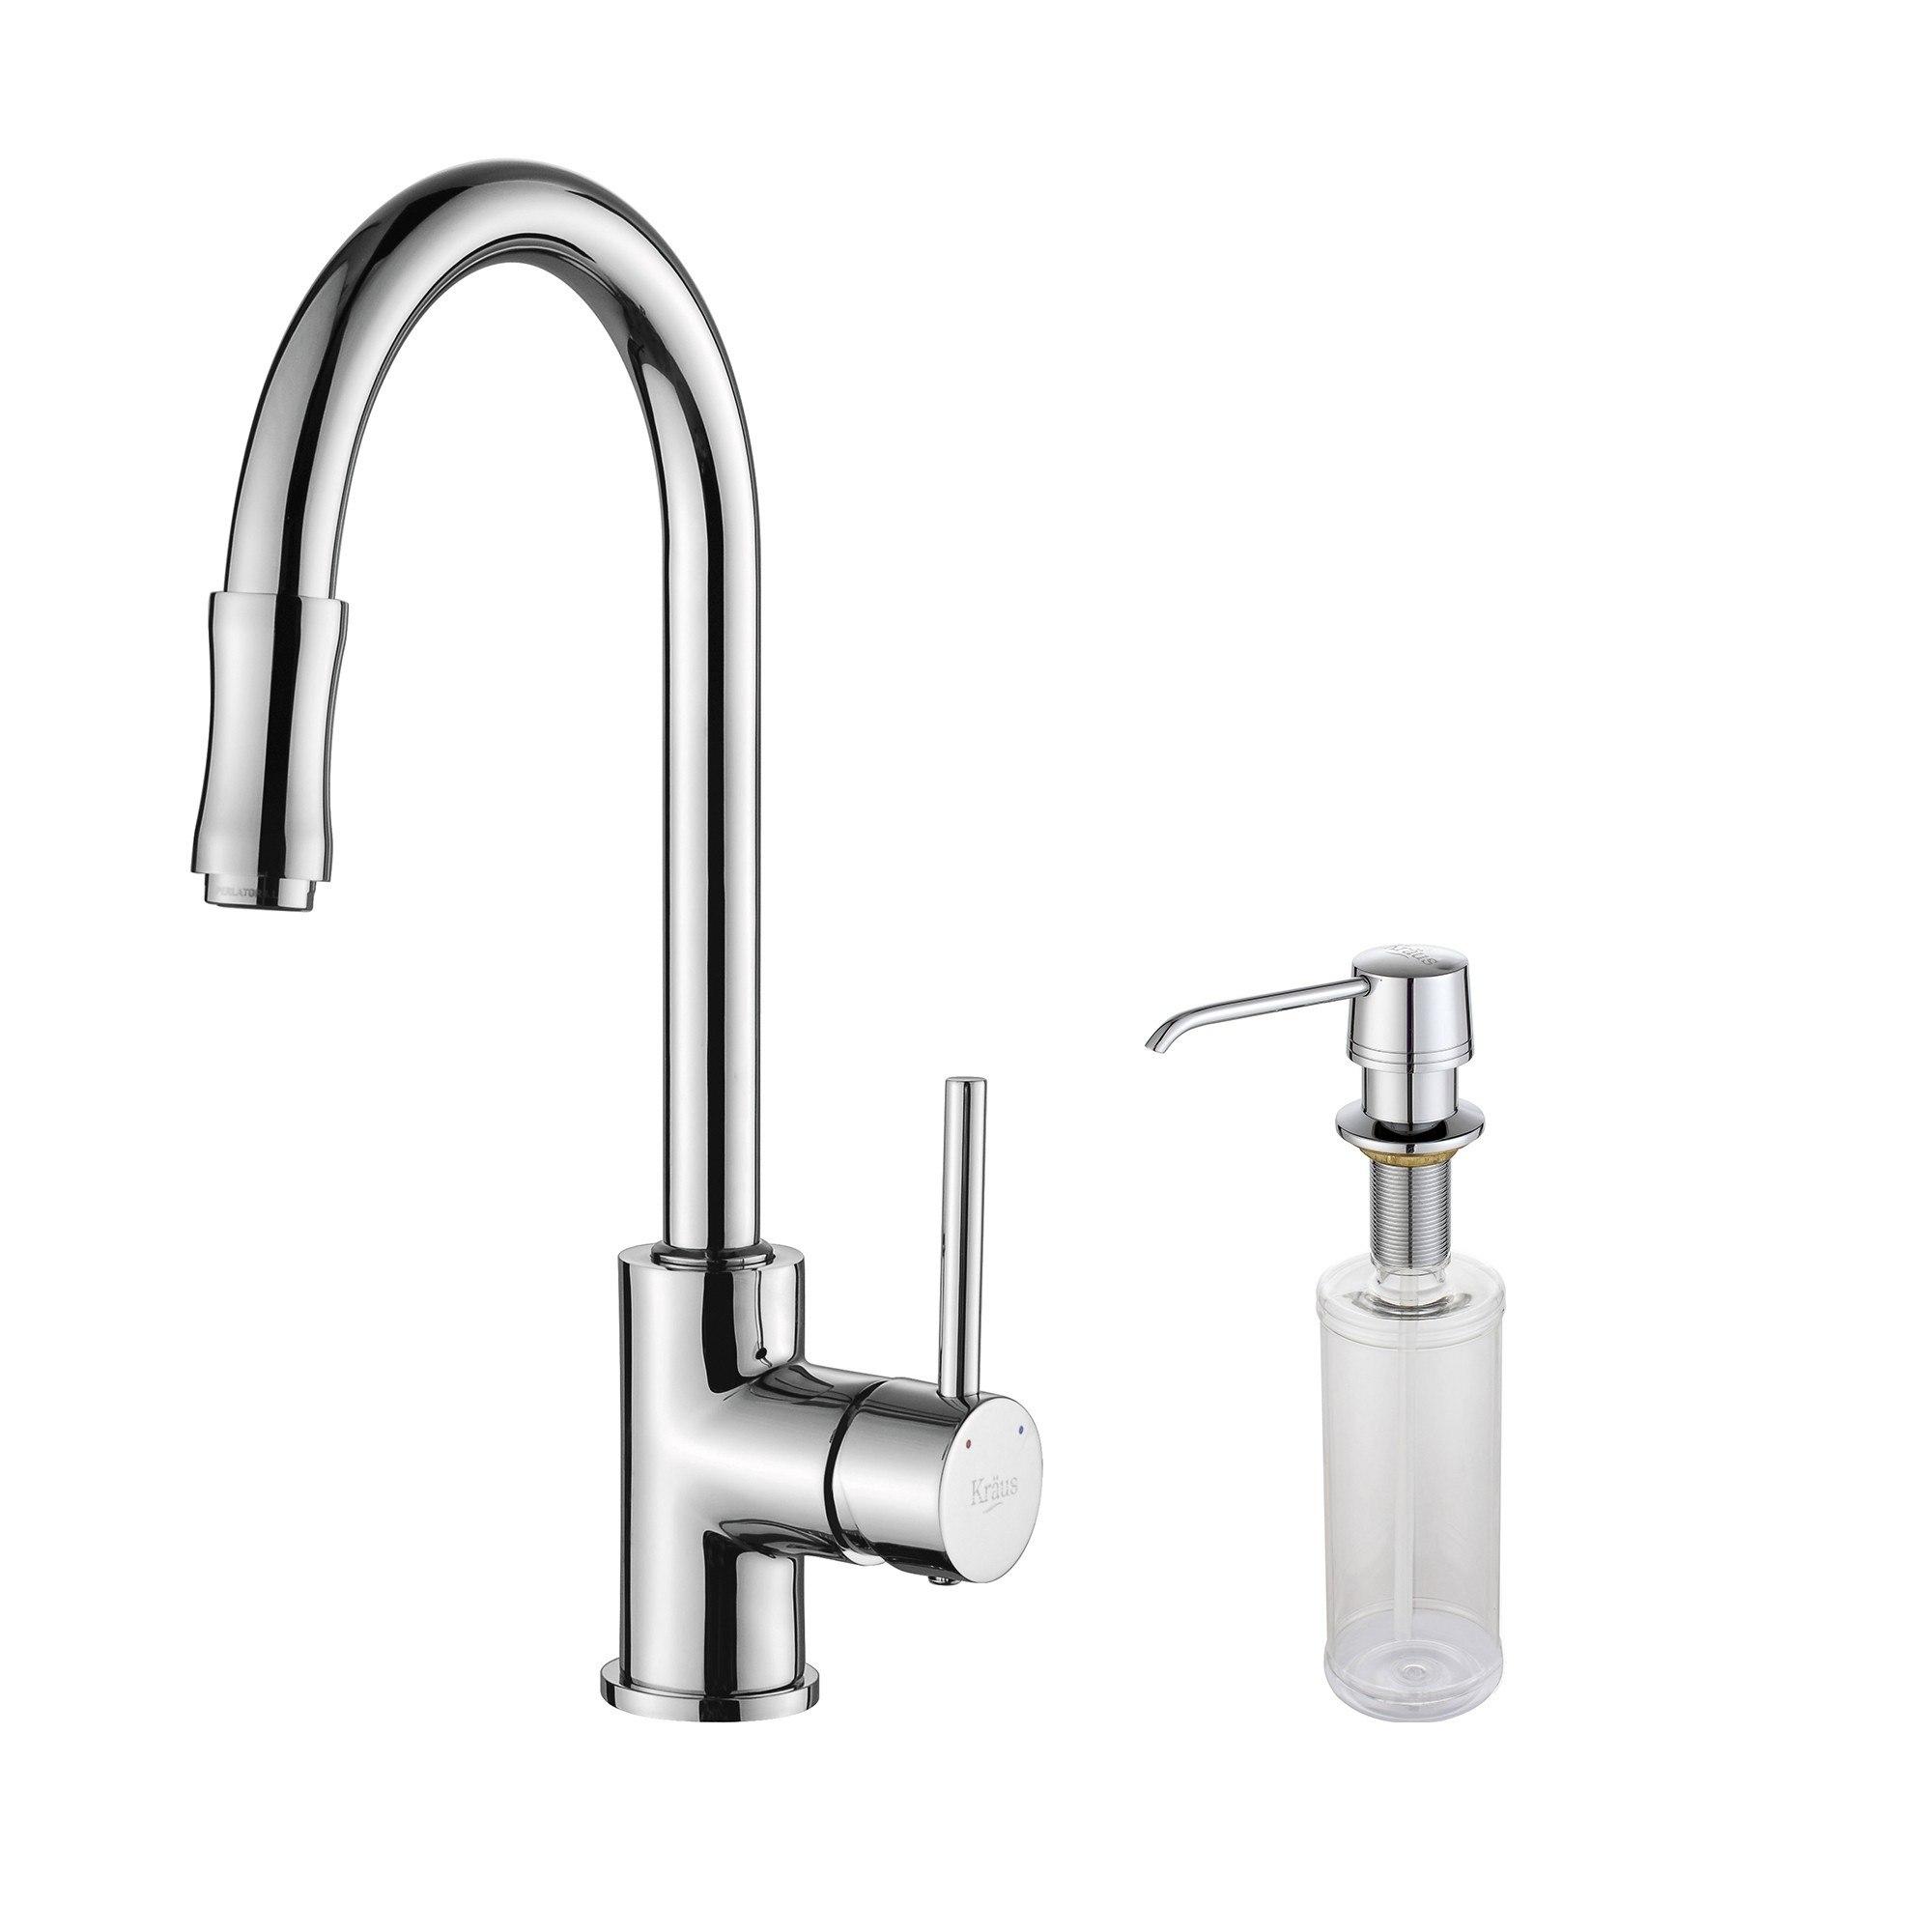 Kraus KPF-1622-KSD-30 Single Lever Pull Out Kitchen Faucet & Soap Dispenser